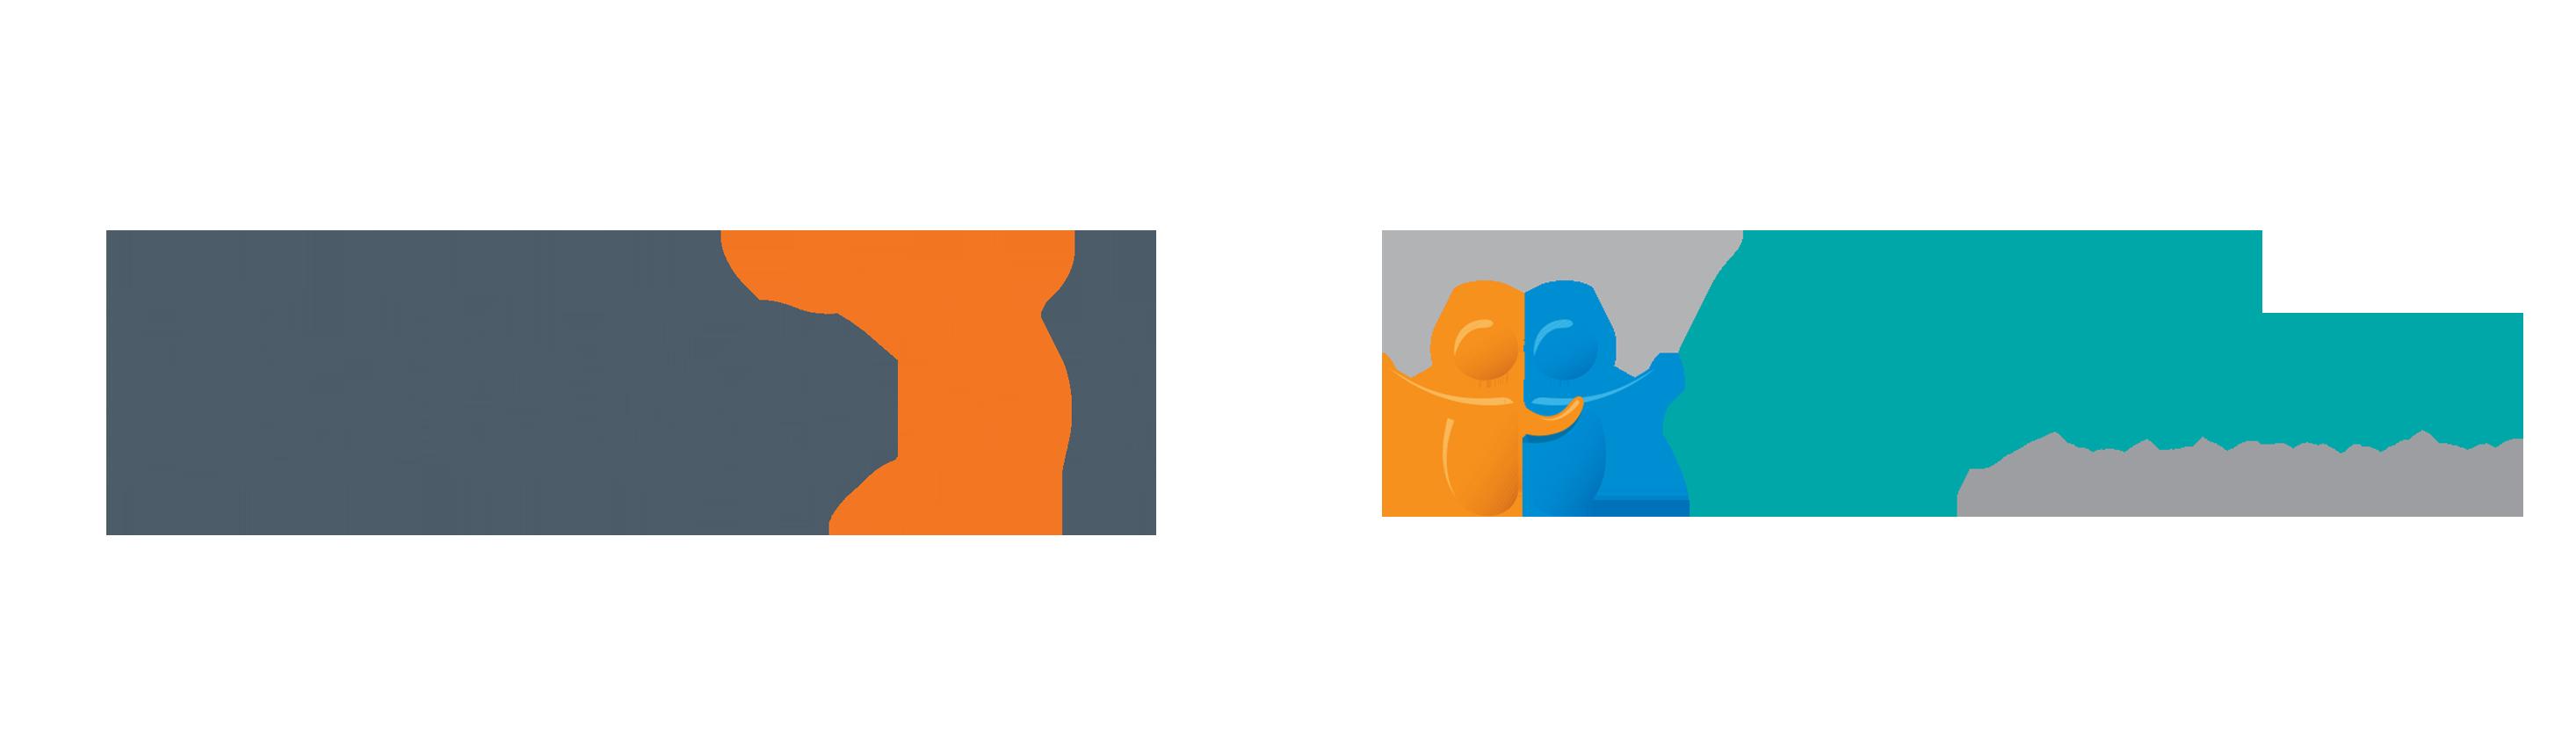 HubSpot SlideShare